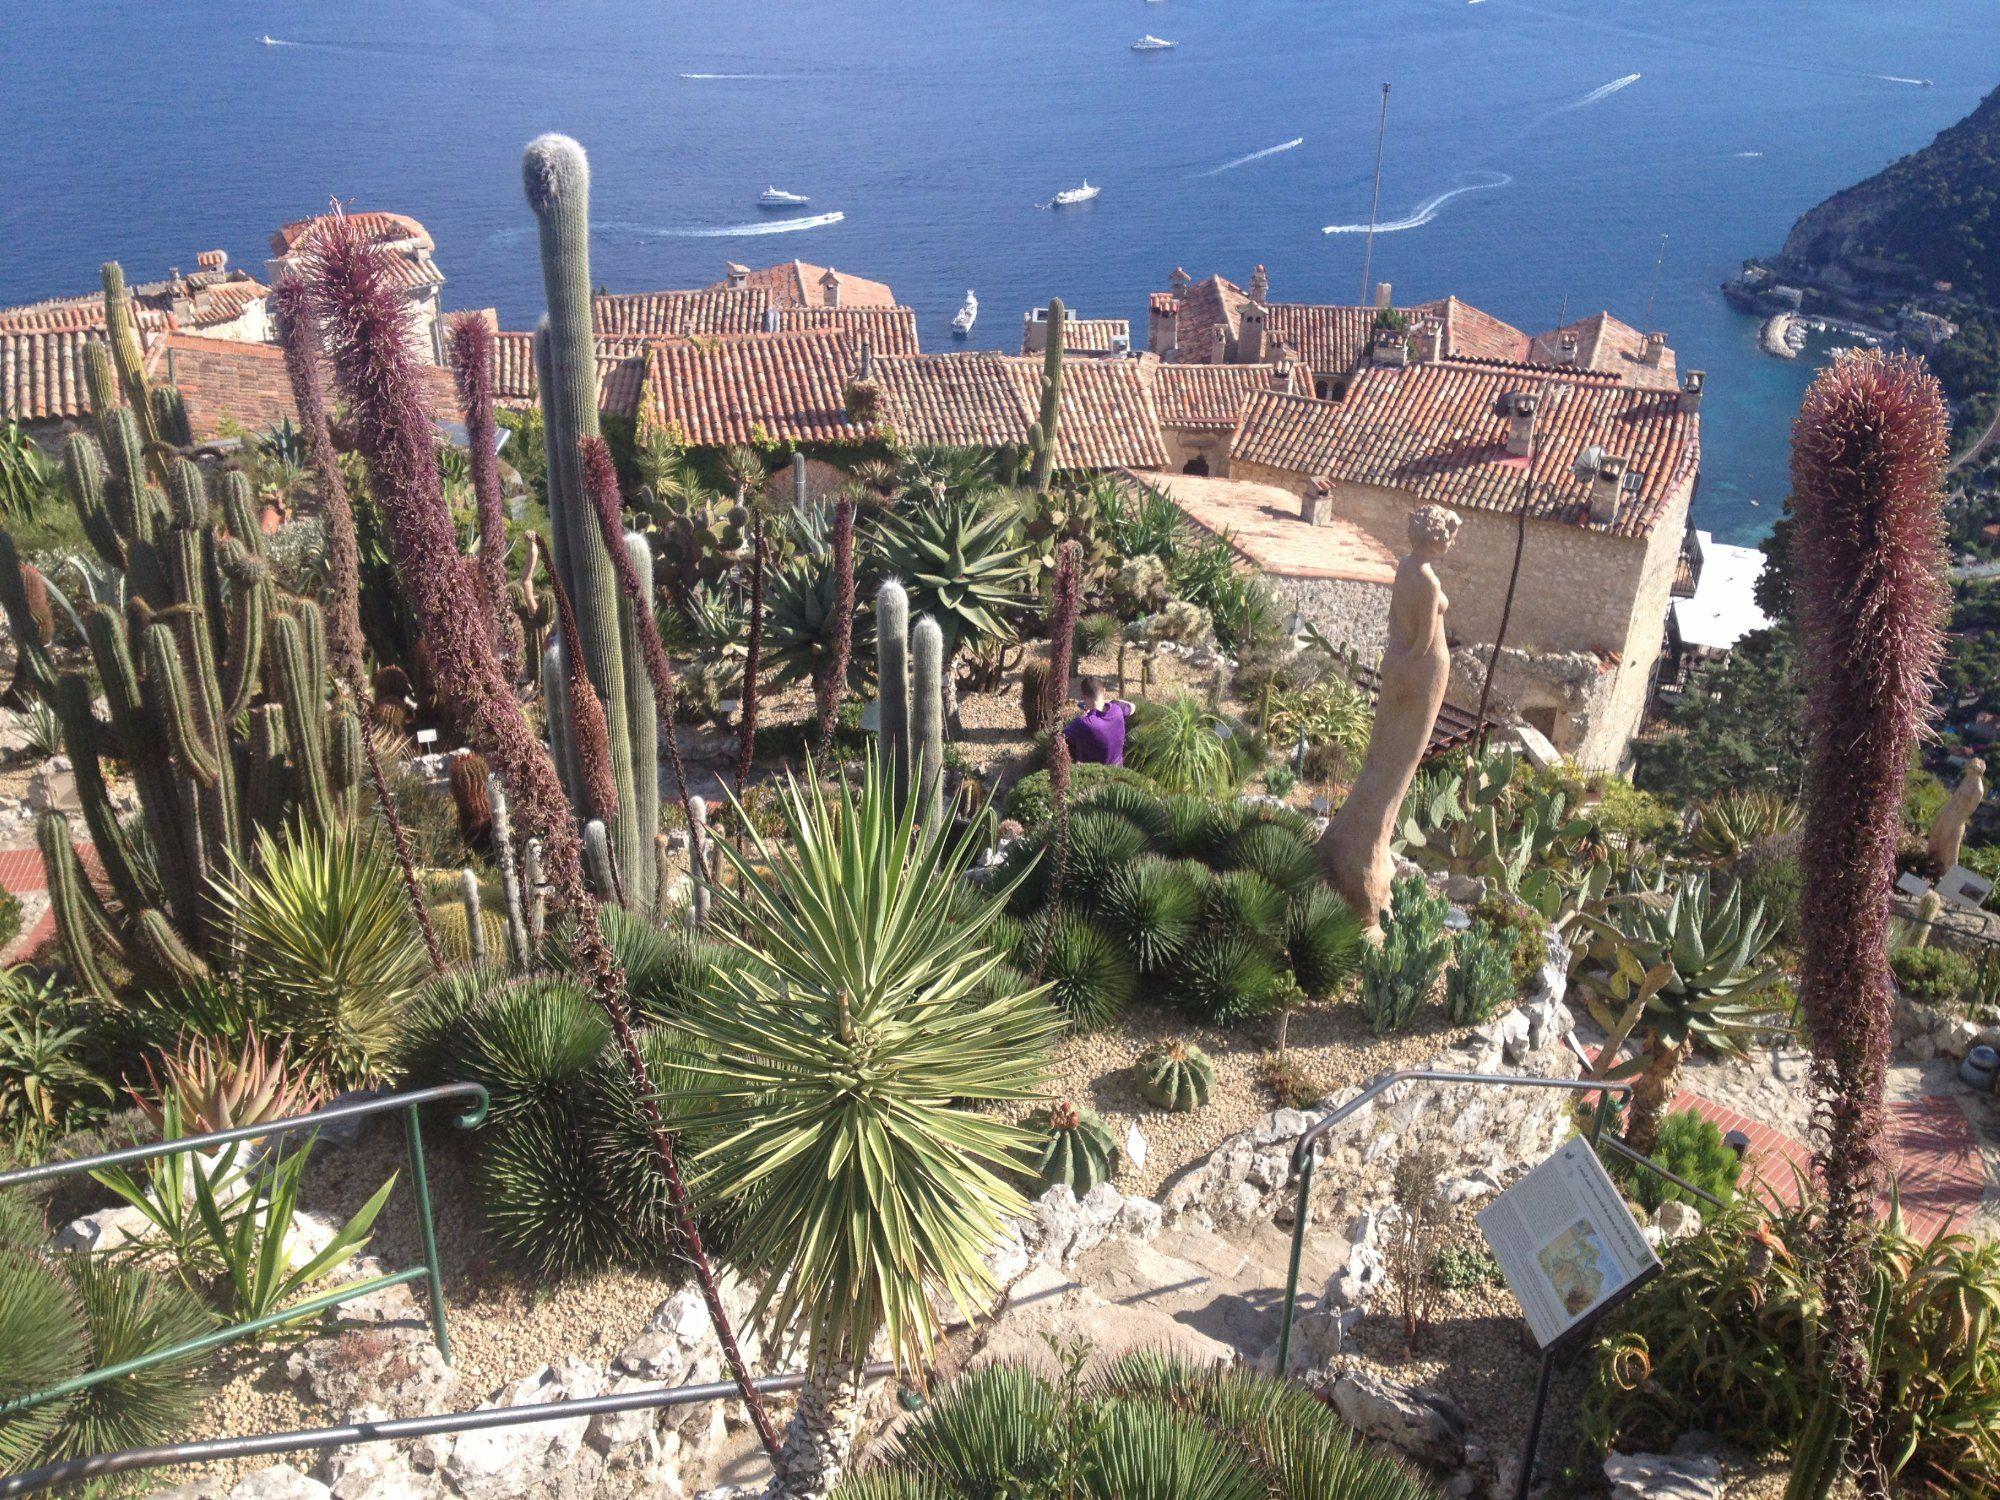 Le Jardin Exotique D Eze France Top Tips Before You Go